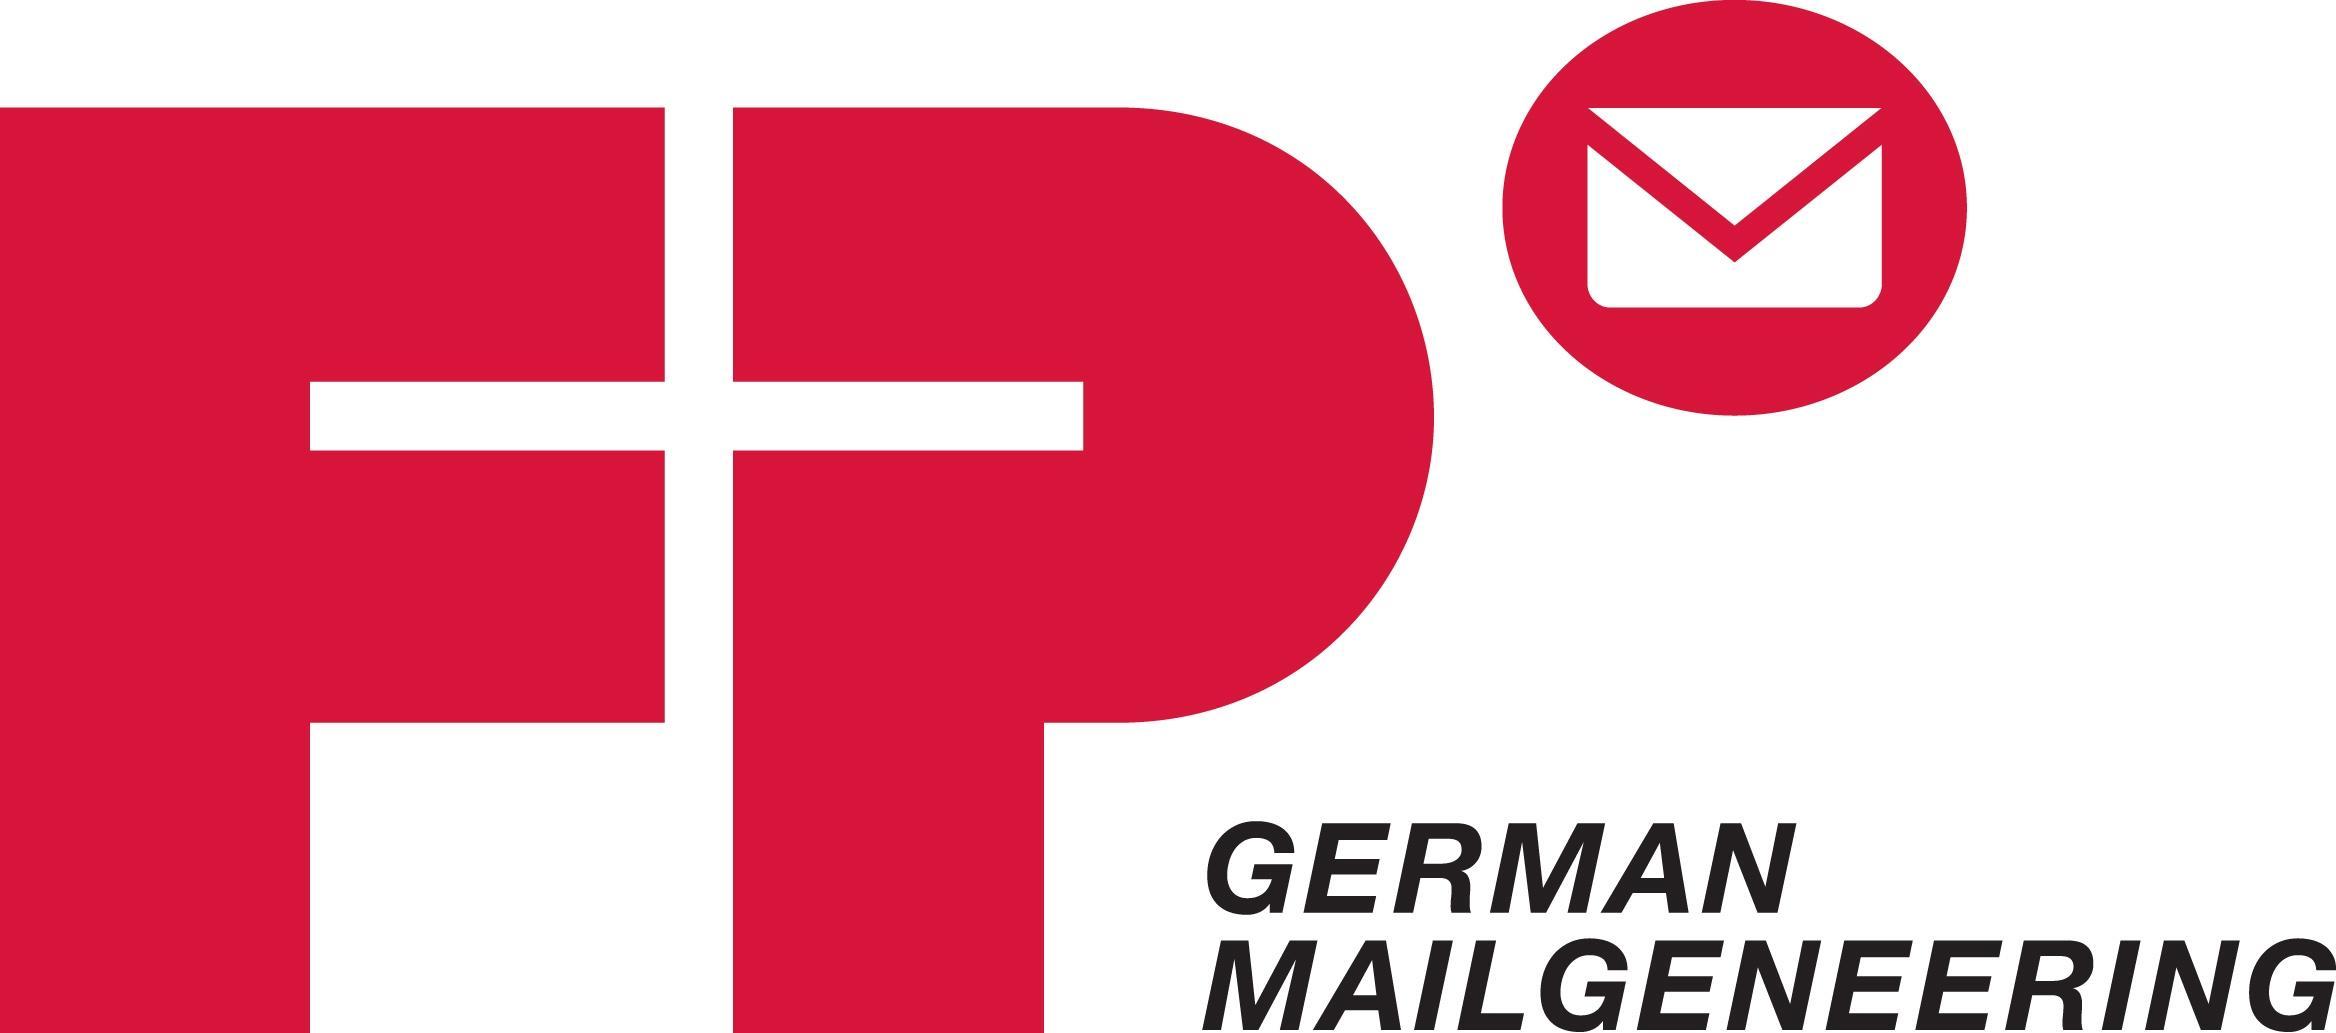 FP_Schriftzug_German-Mailgeneering_RGB.jpg